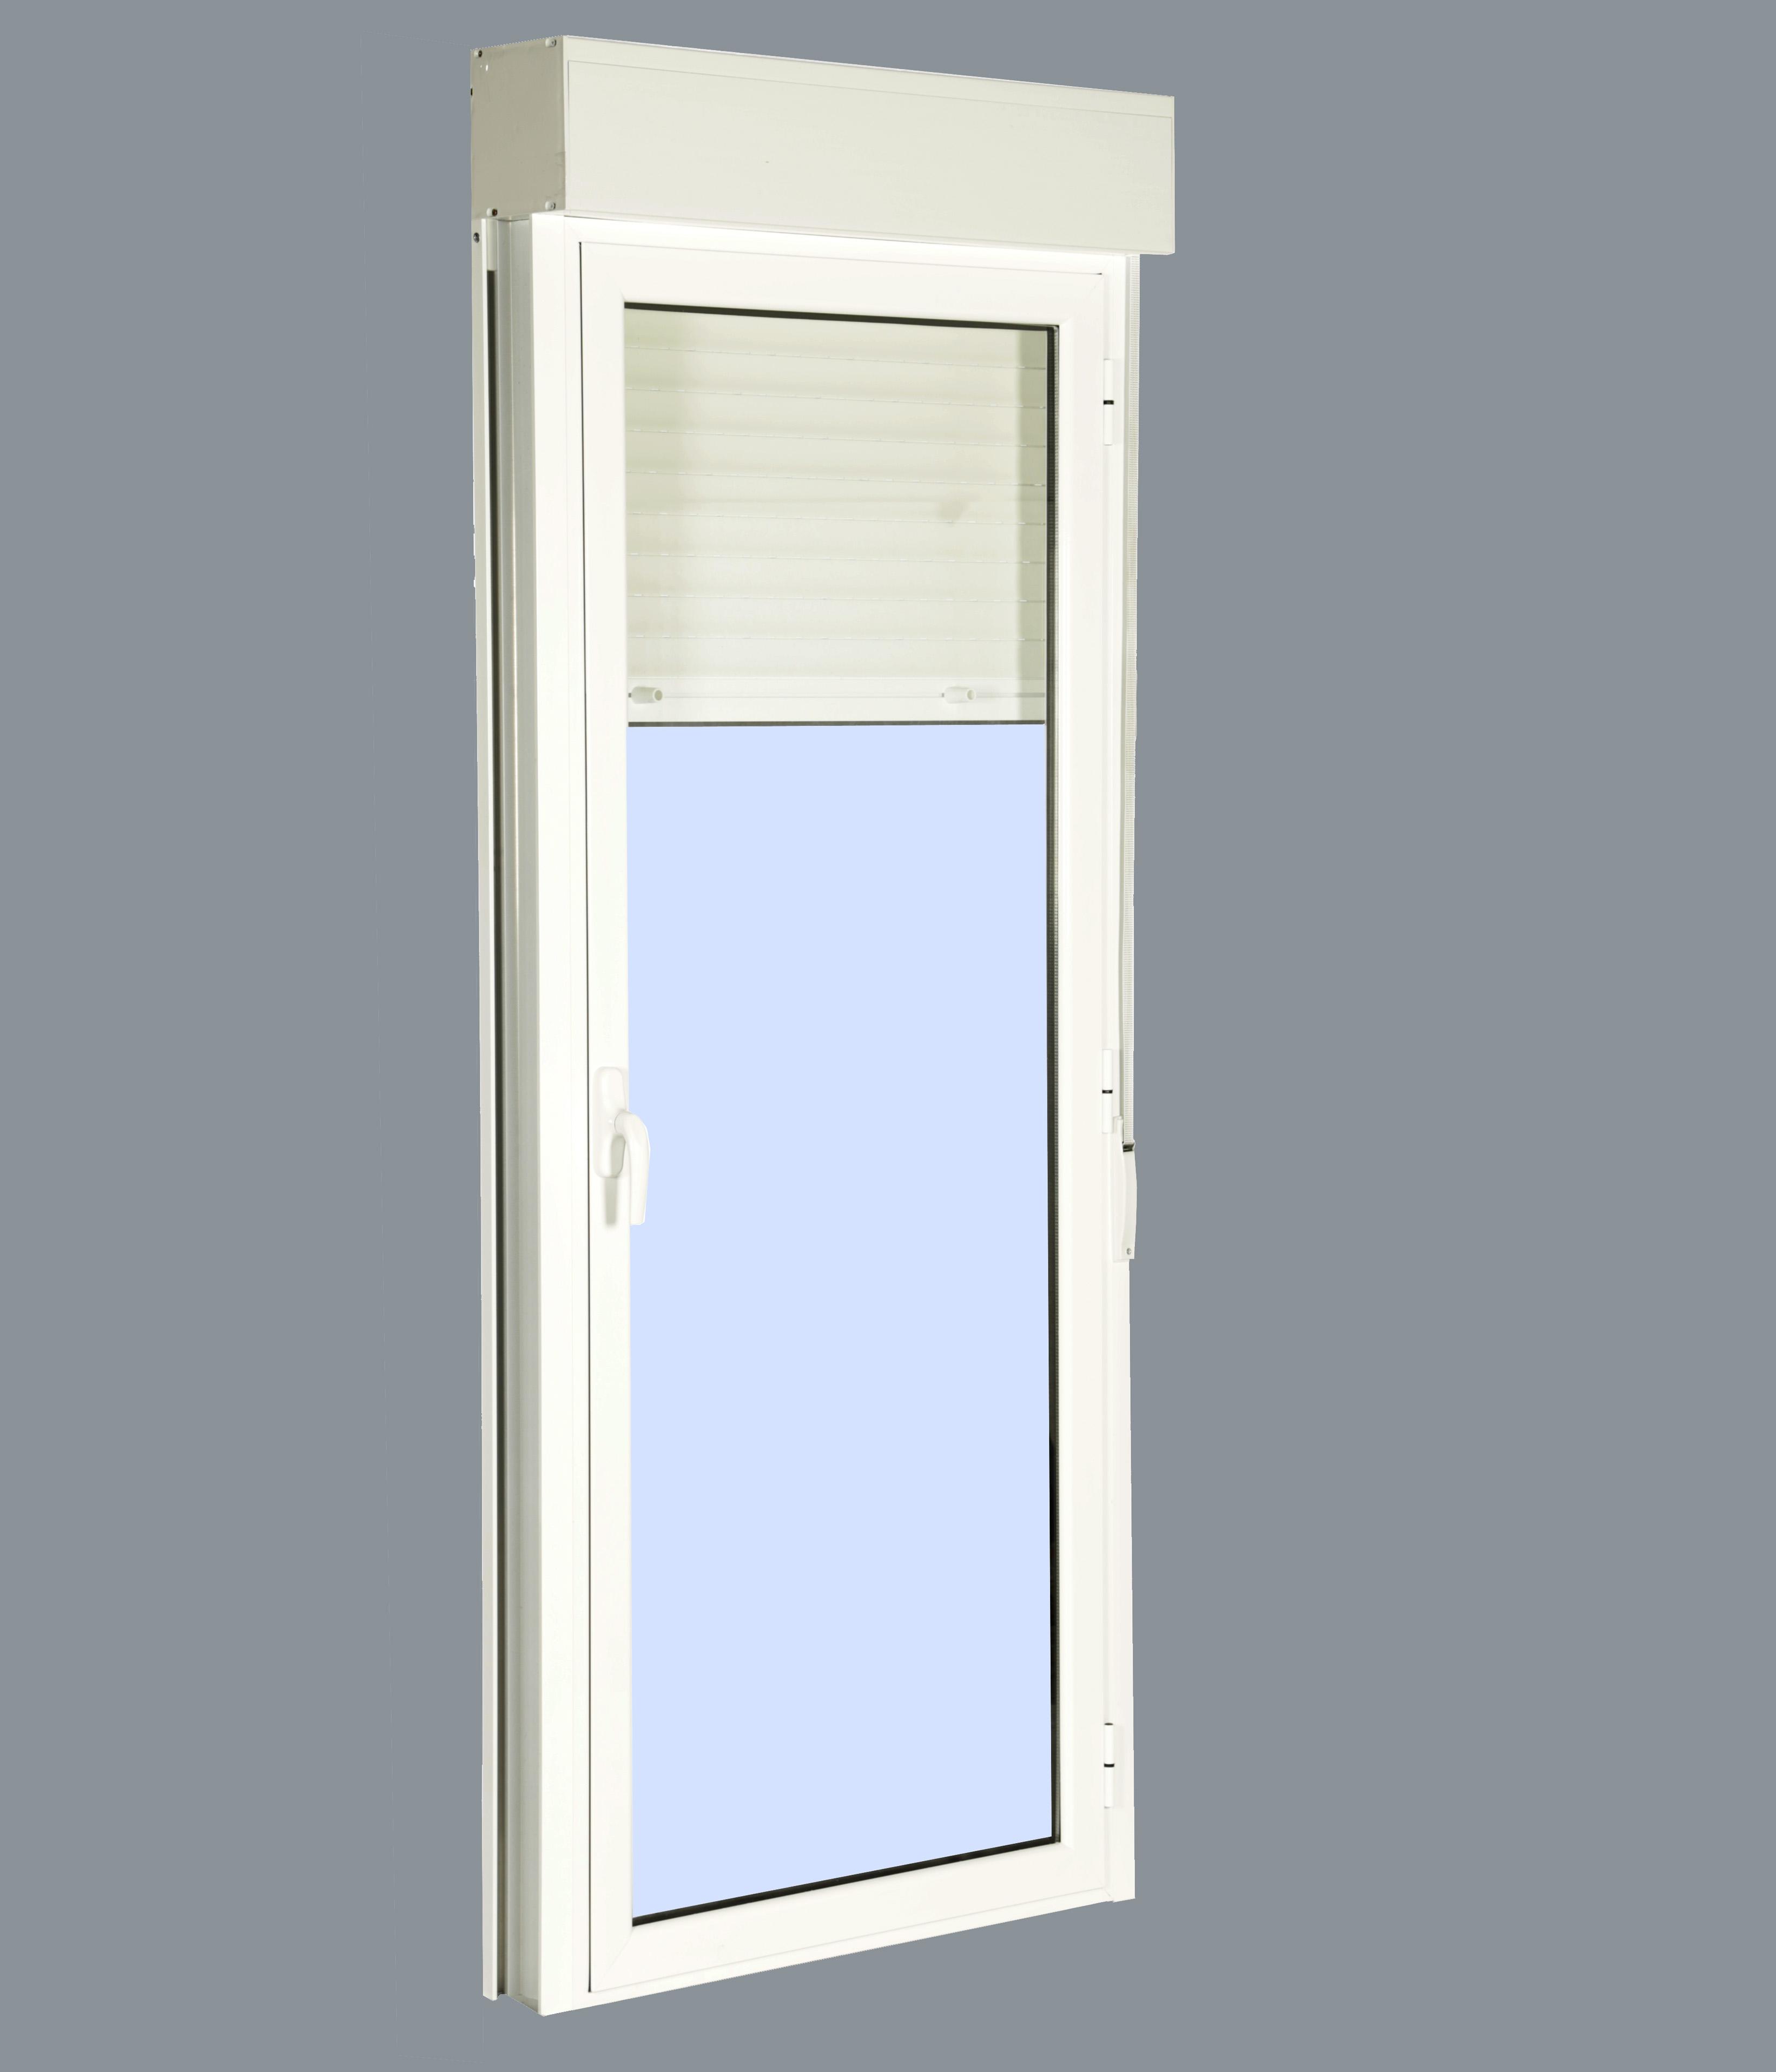 Balconera aluminio leroy merlin balconera aluminio leroy for Mosquiteras correderas bricomart